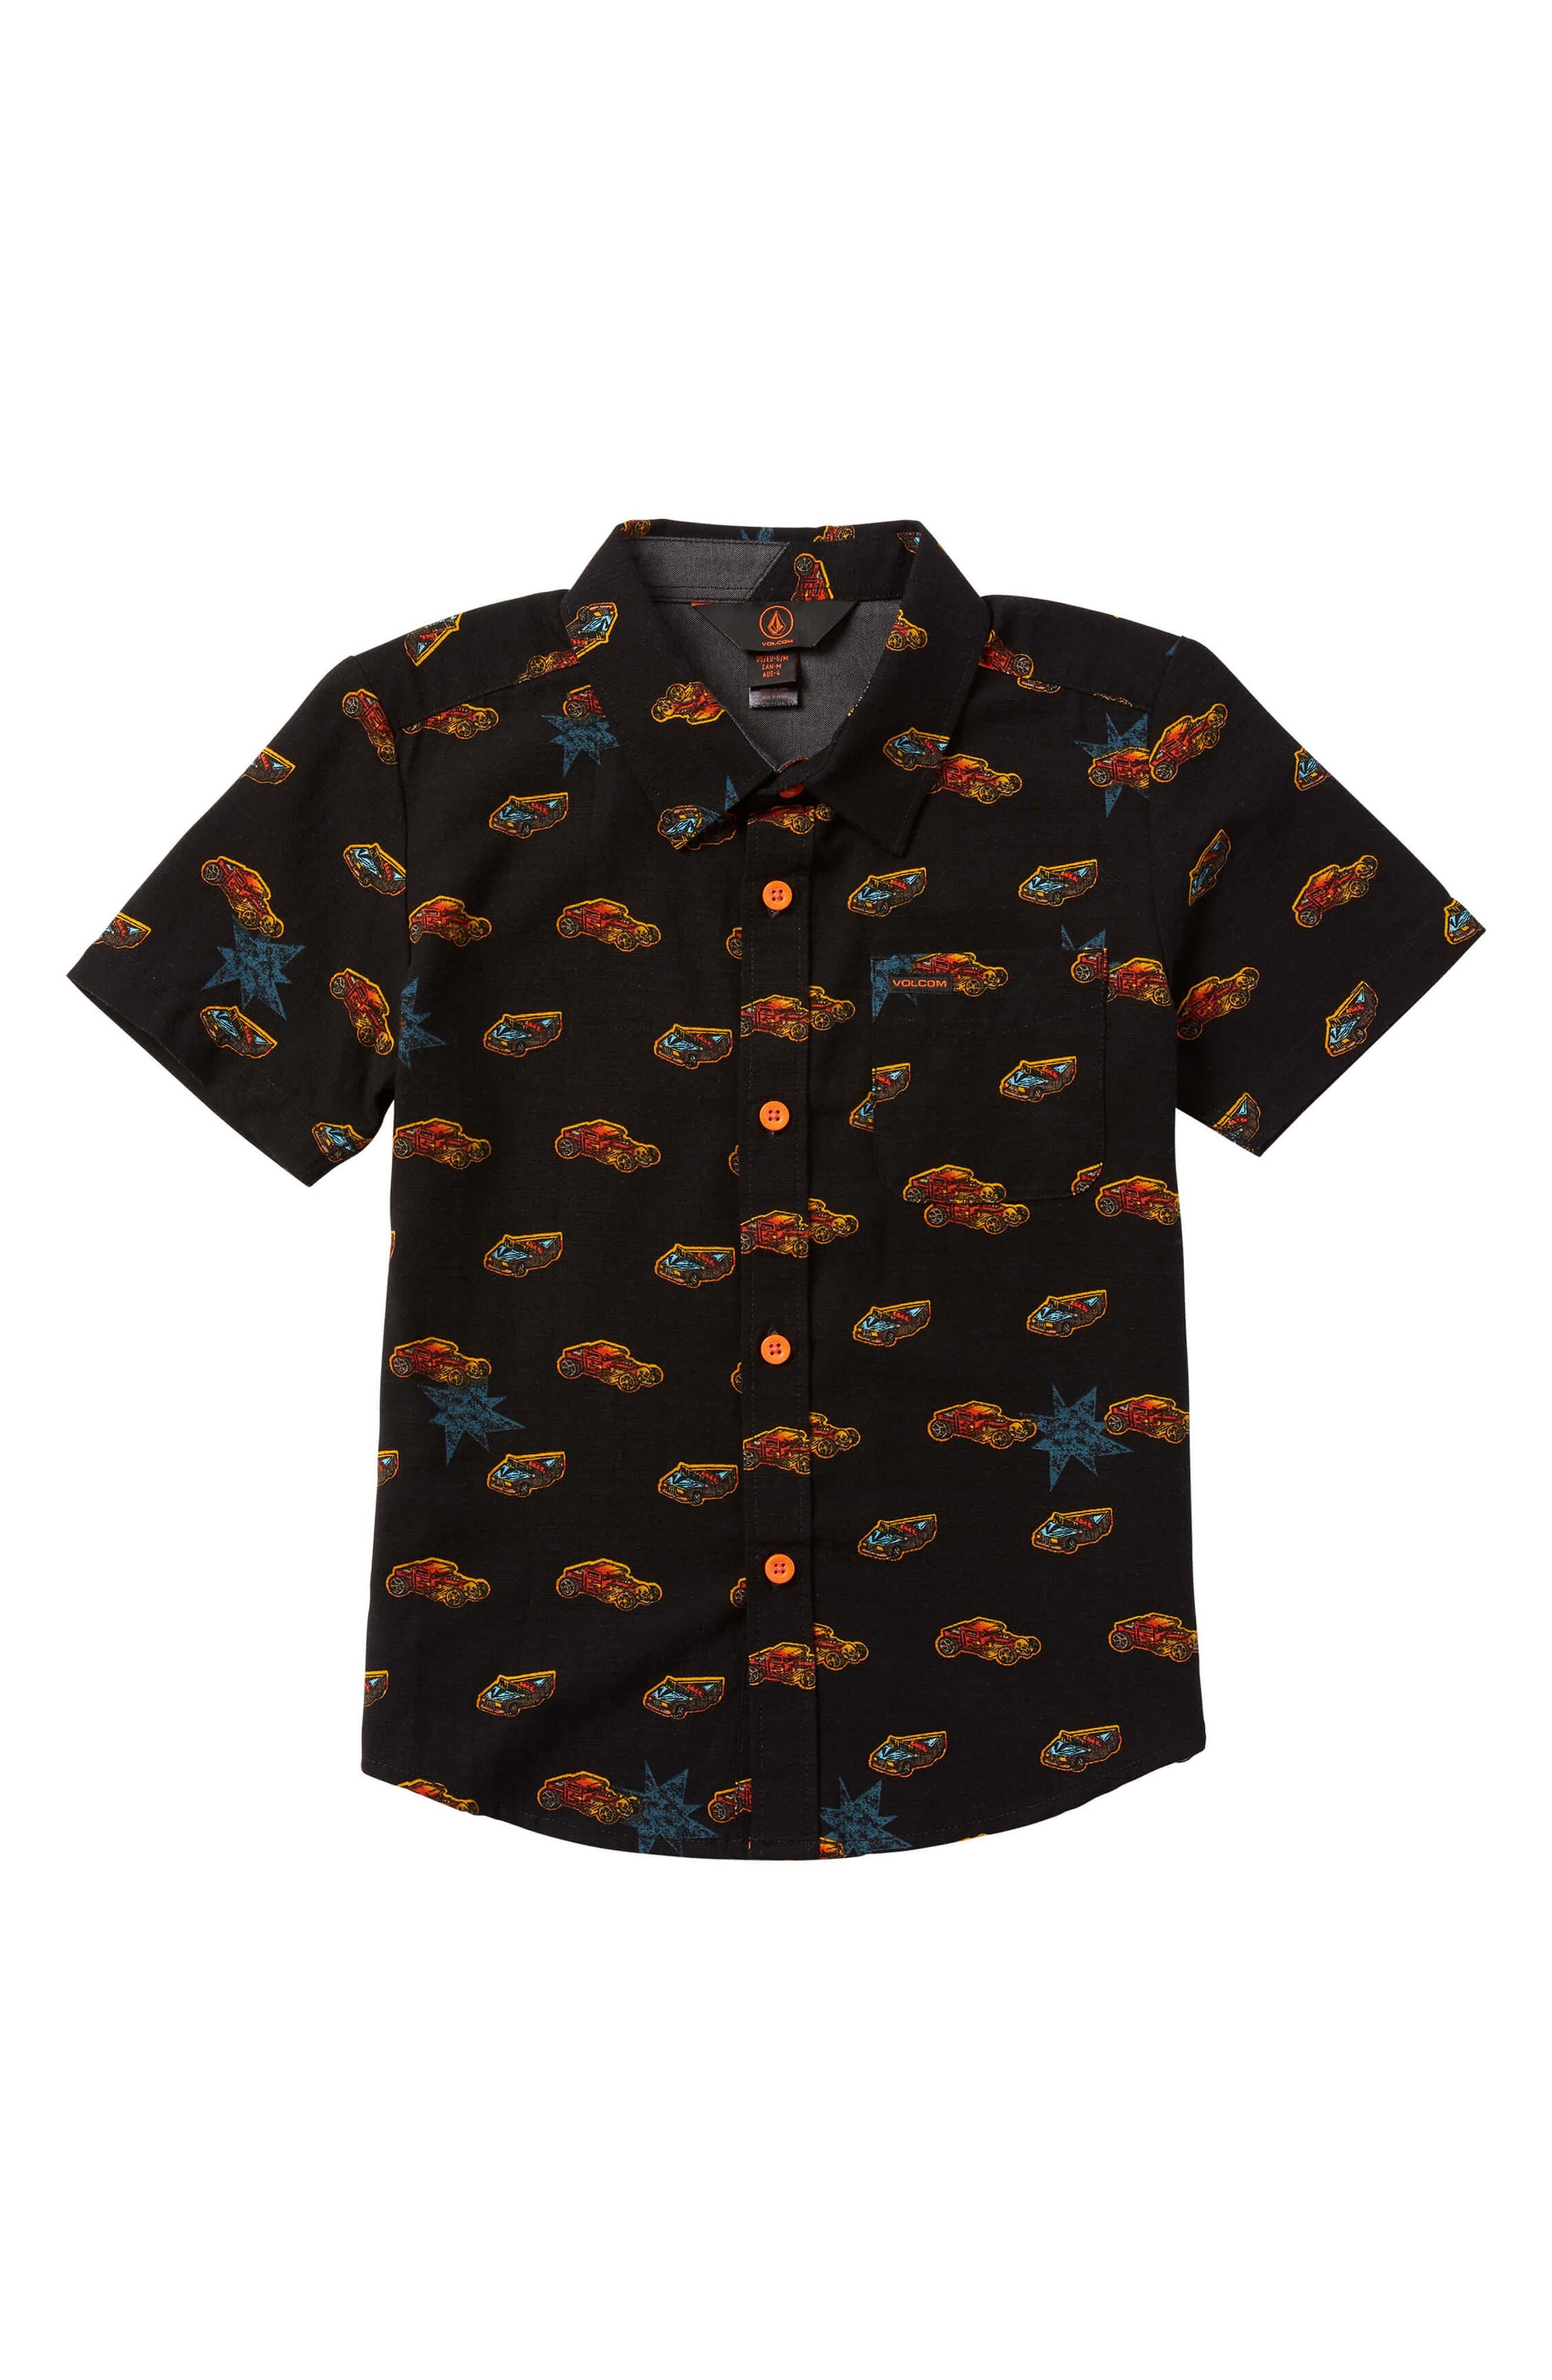 VOLCOM x Hot Wheels<sup>®</sup> Woven Shirt, Main, color, 001